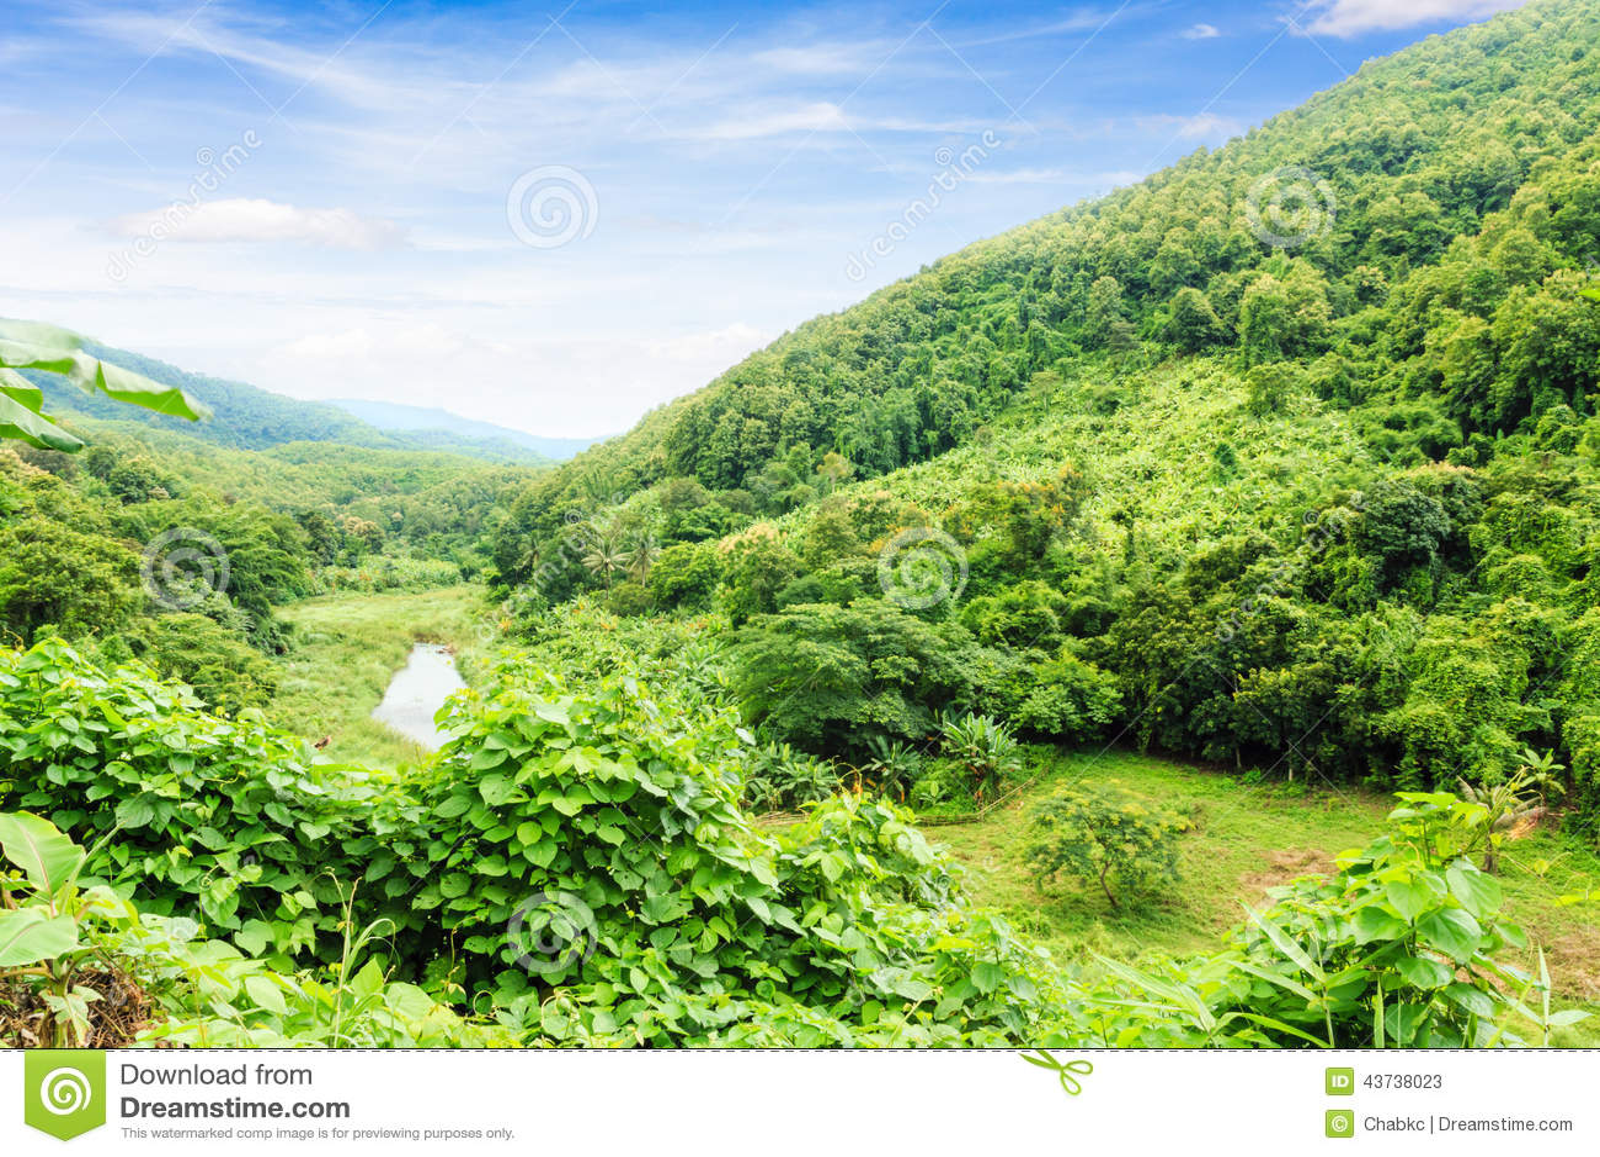 Paysage de vert for t photo stock image 43738023 for Paysage vert